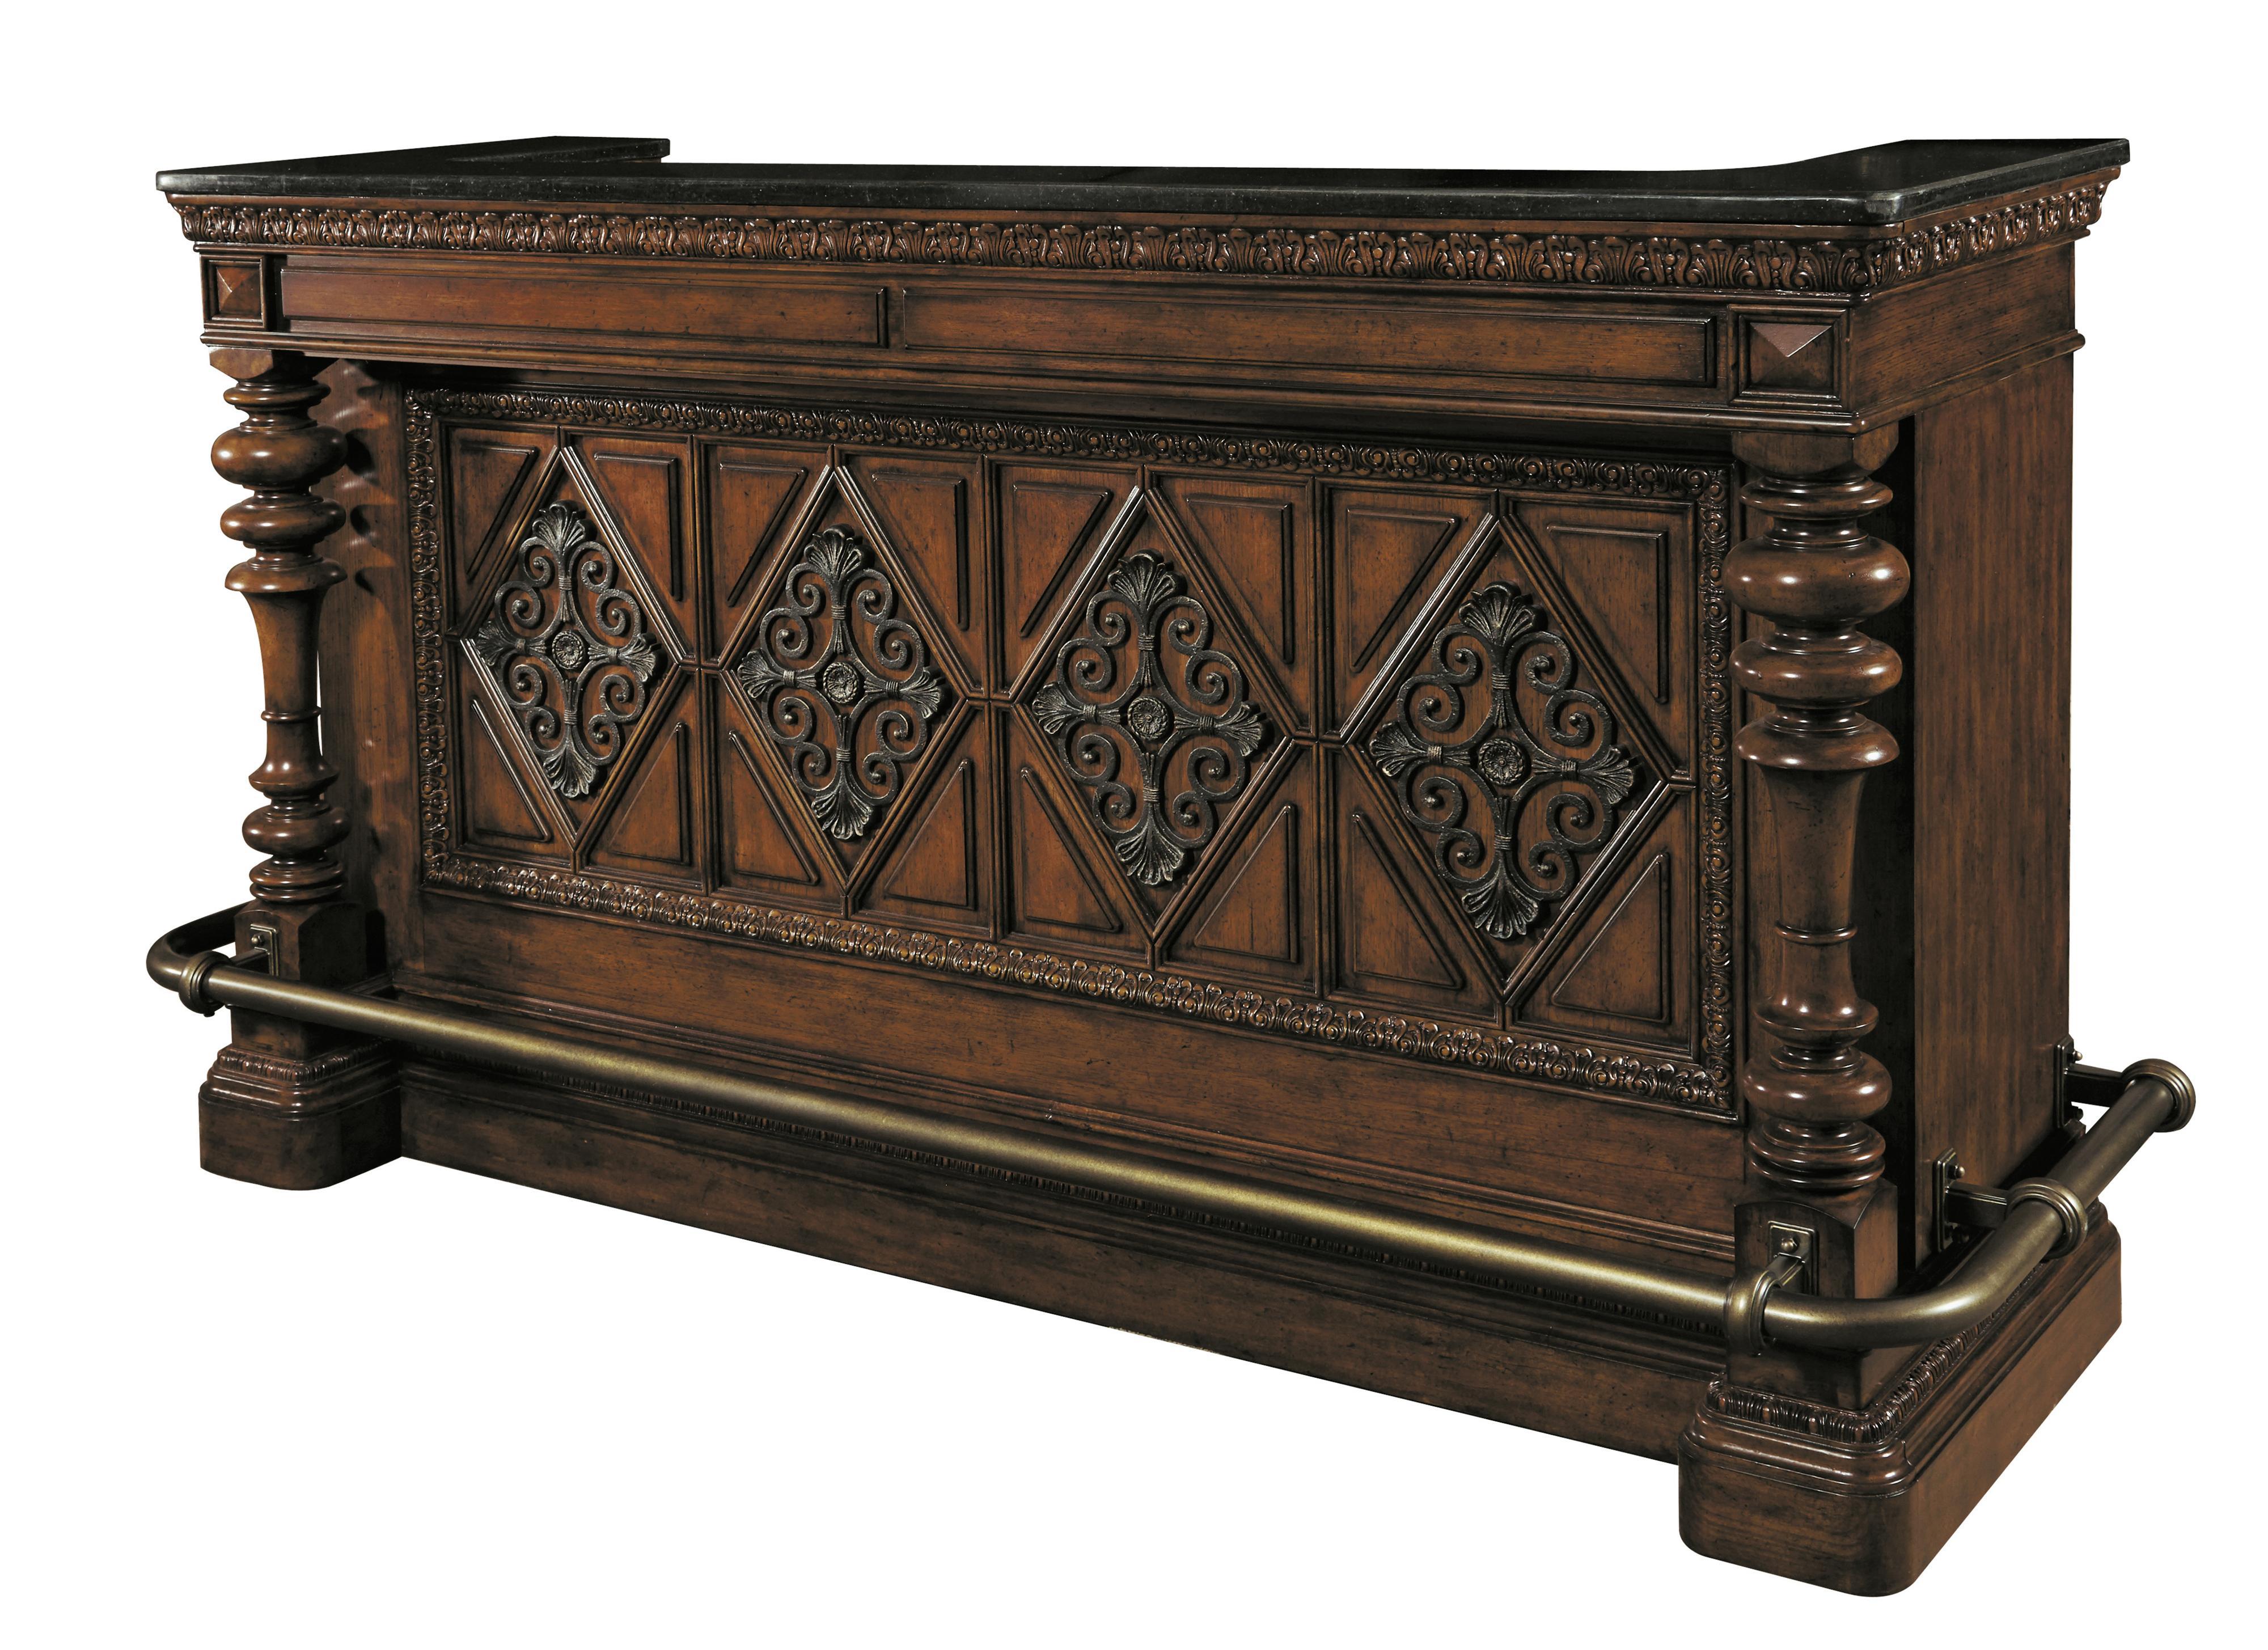 Pulaski Furniture Accents Coronado Estates Bar - Item Number: 665500+449